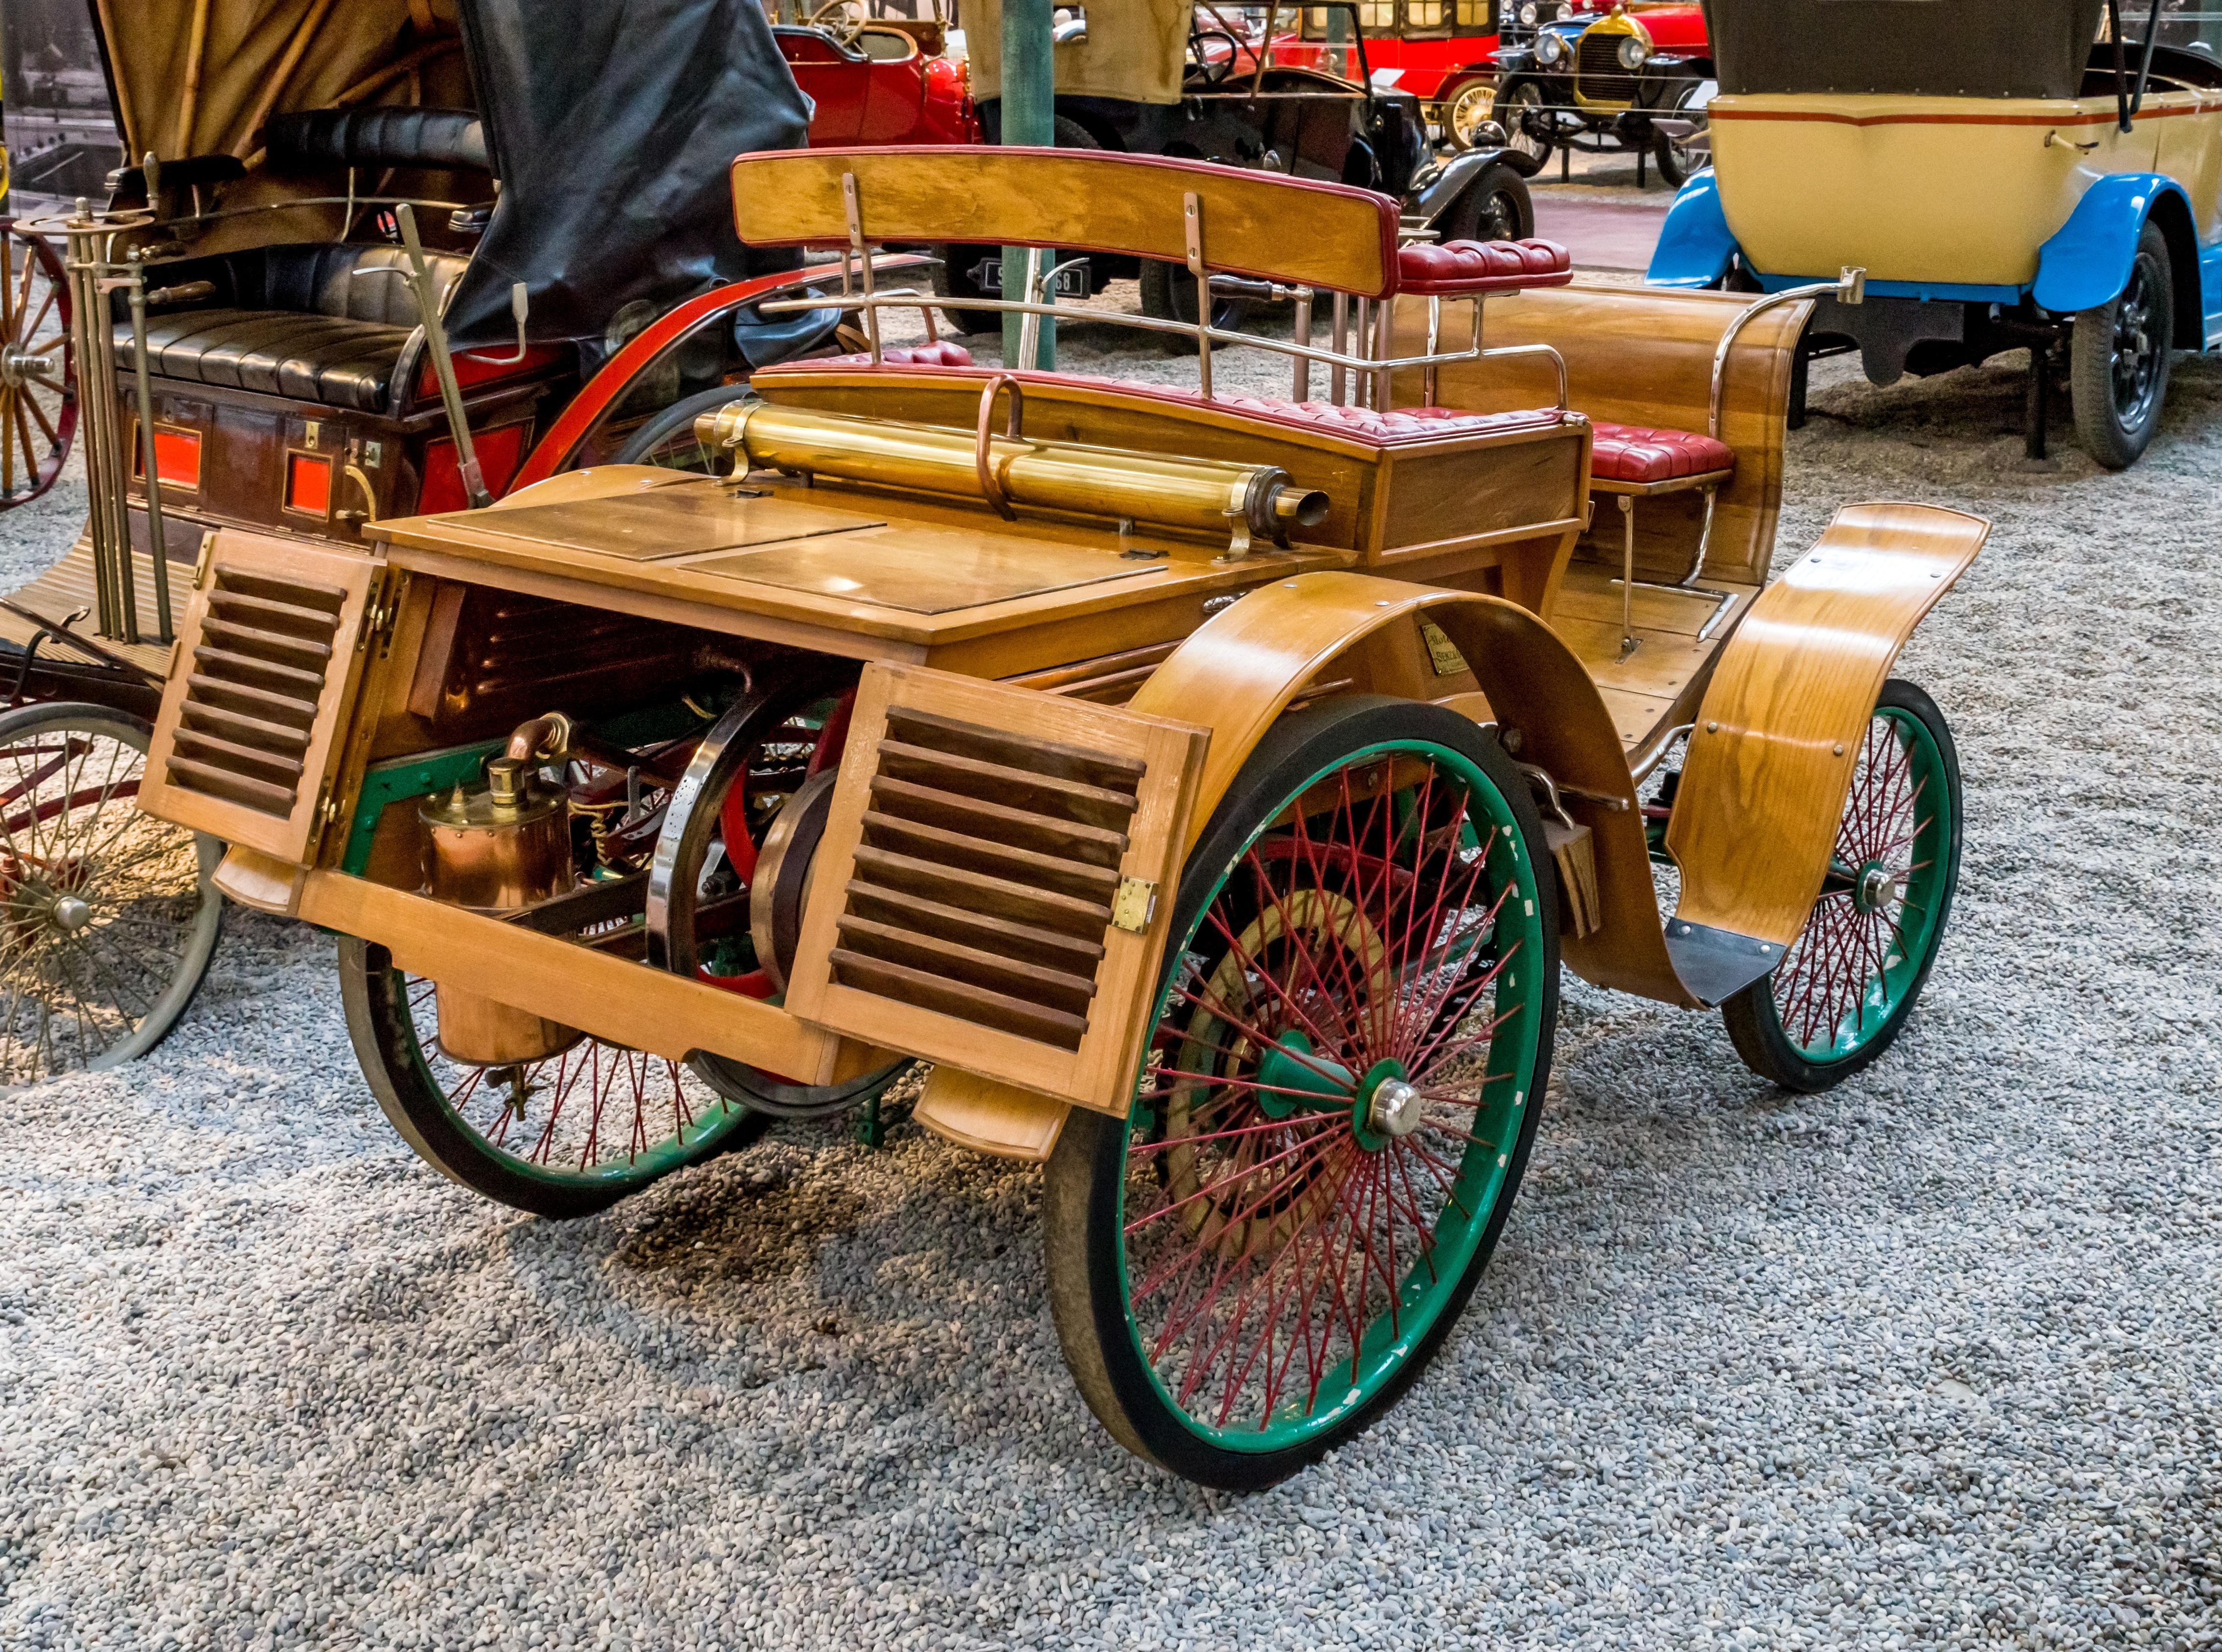 File:Benz Dogcart 3 5 hp (1898) jm64250 jpg - Wikimedia Commons